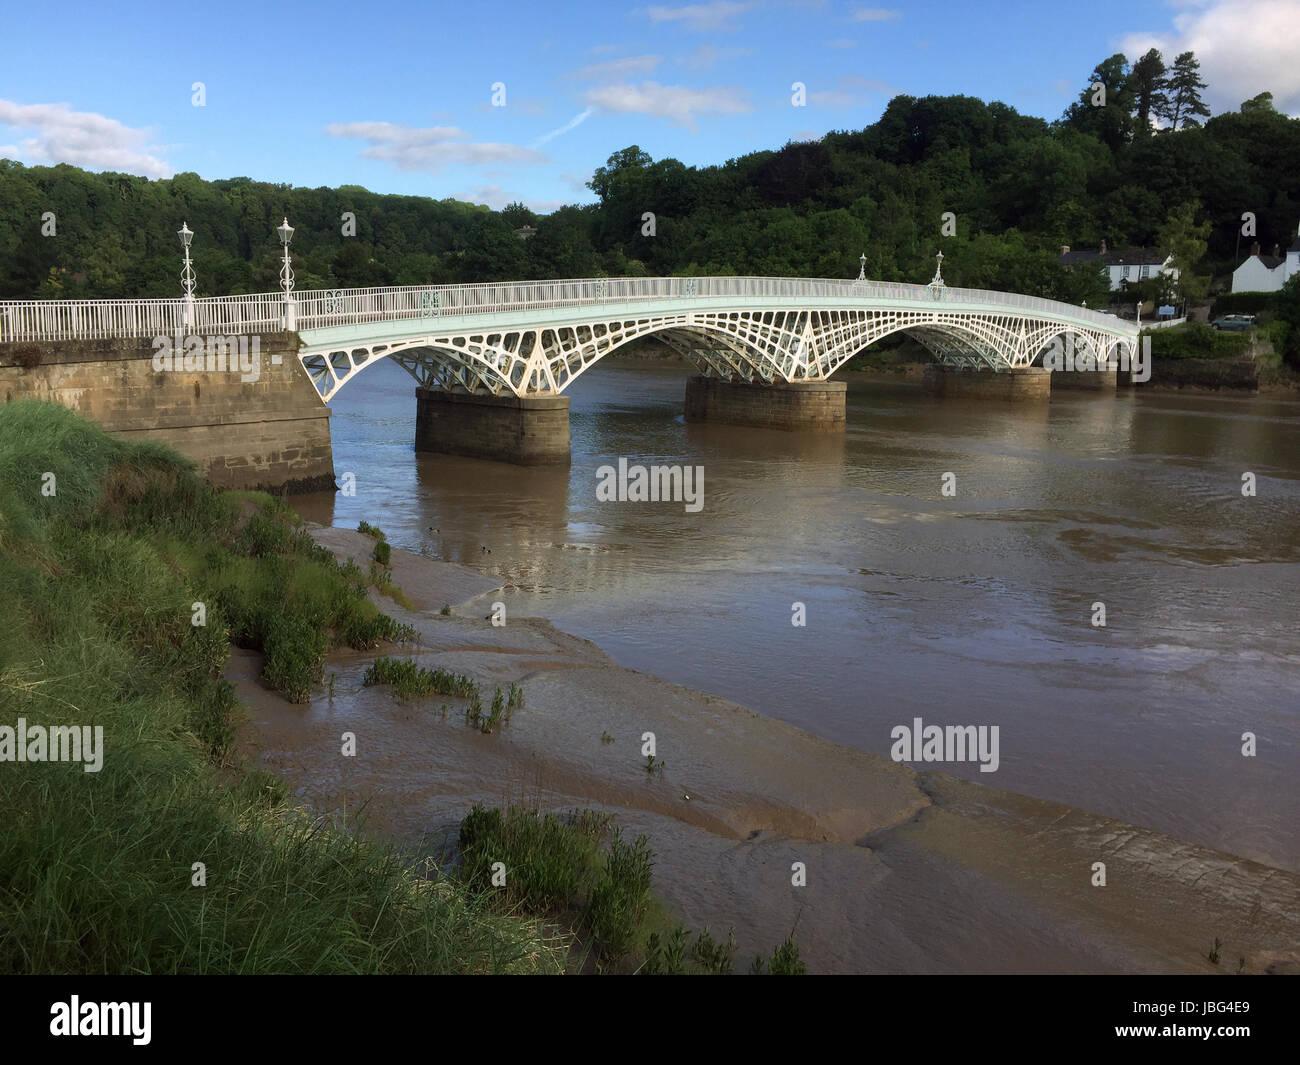 CHEPSTOW ROAD BRIDGE across the Wye built in 1816. Photo: Tony Gale Stock Photo